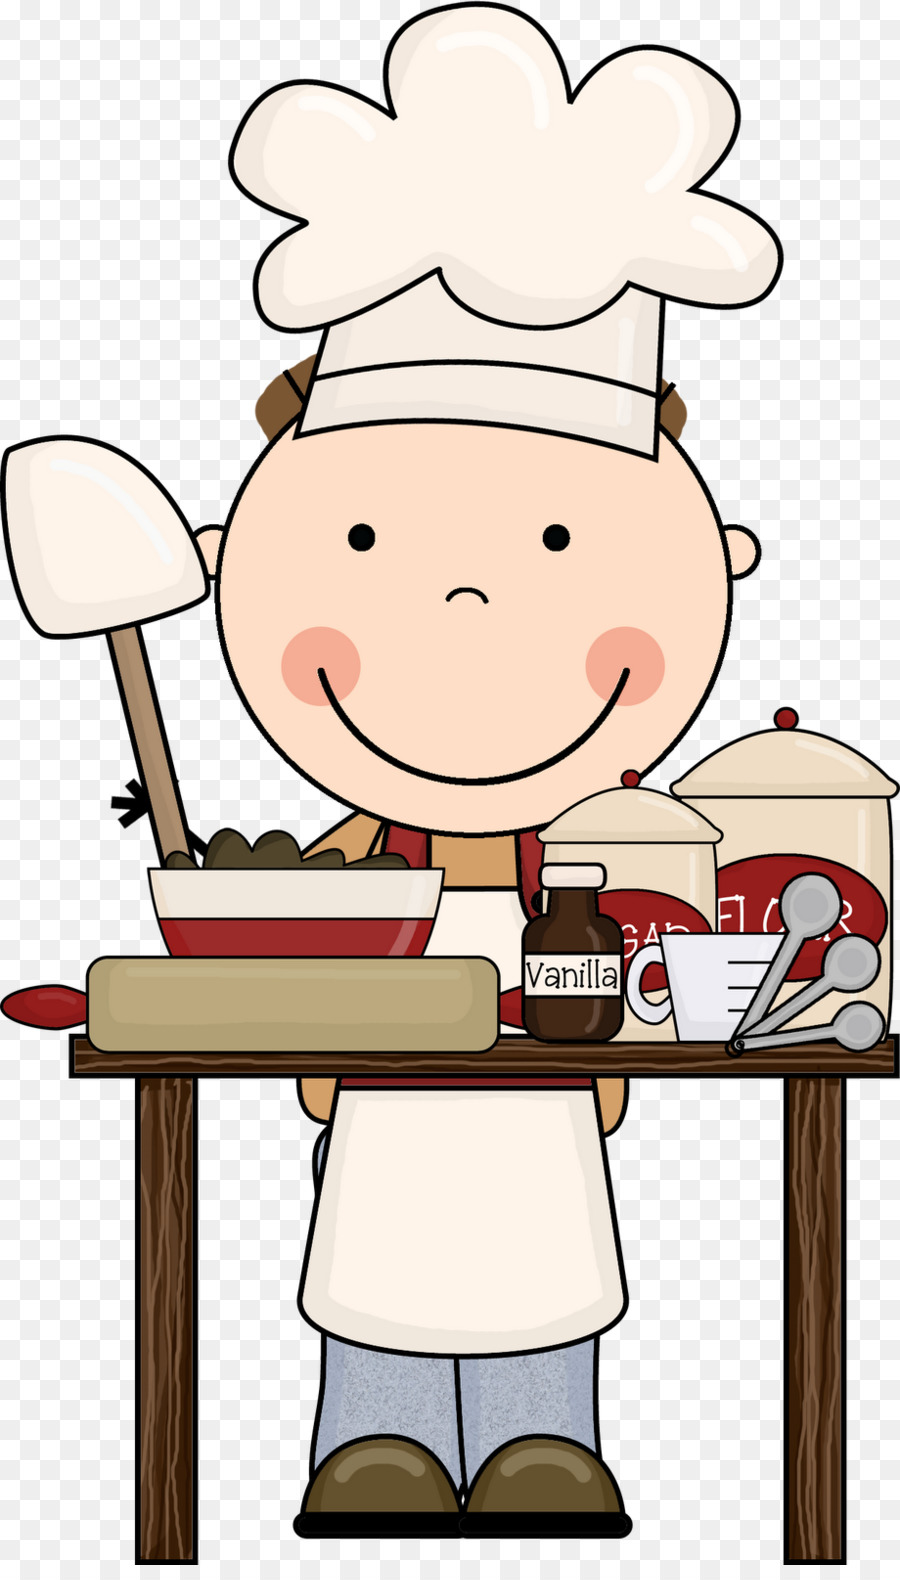 Chef Cartoon clipart.